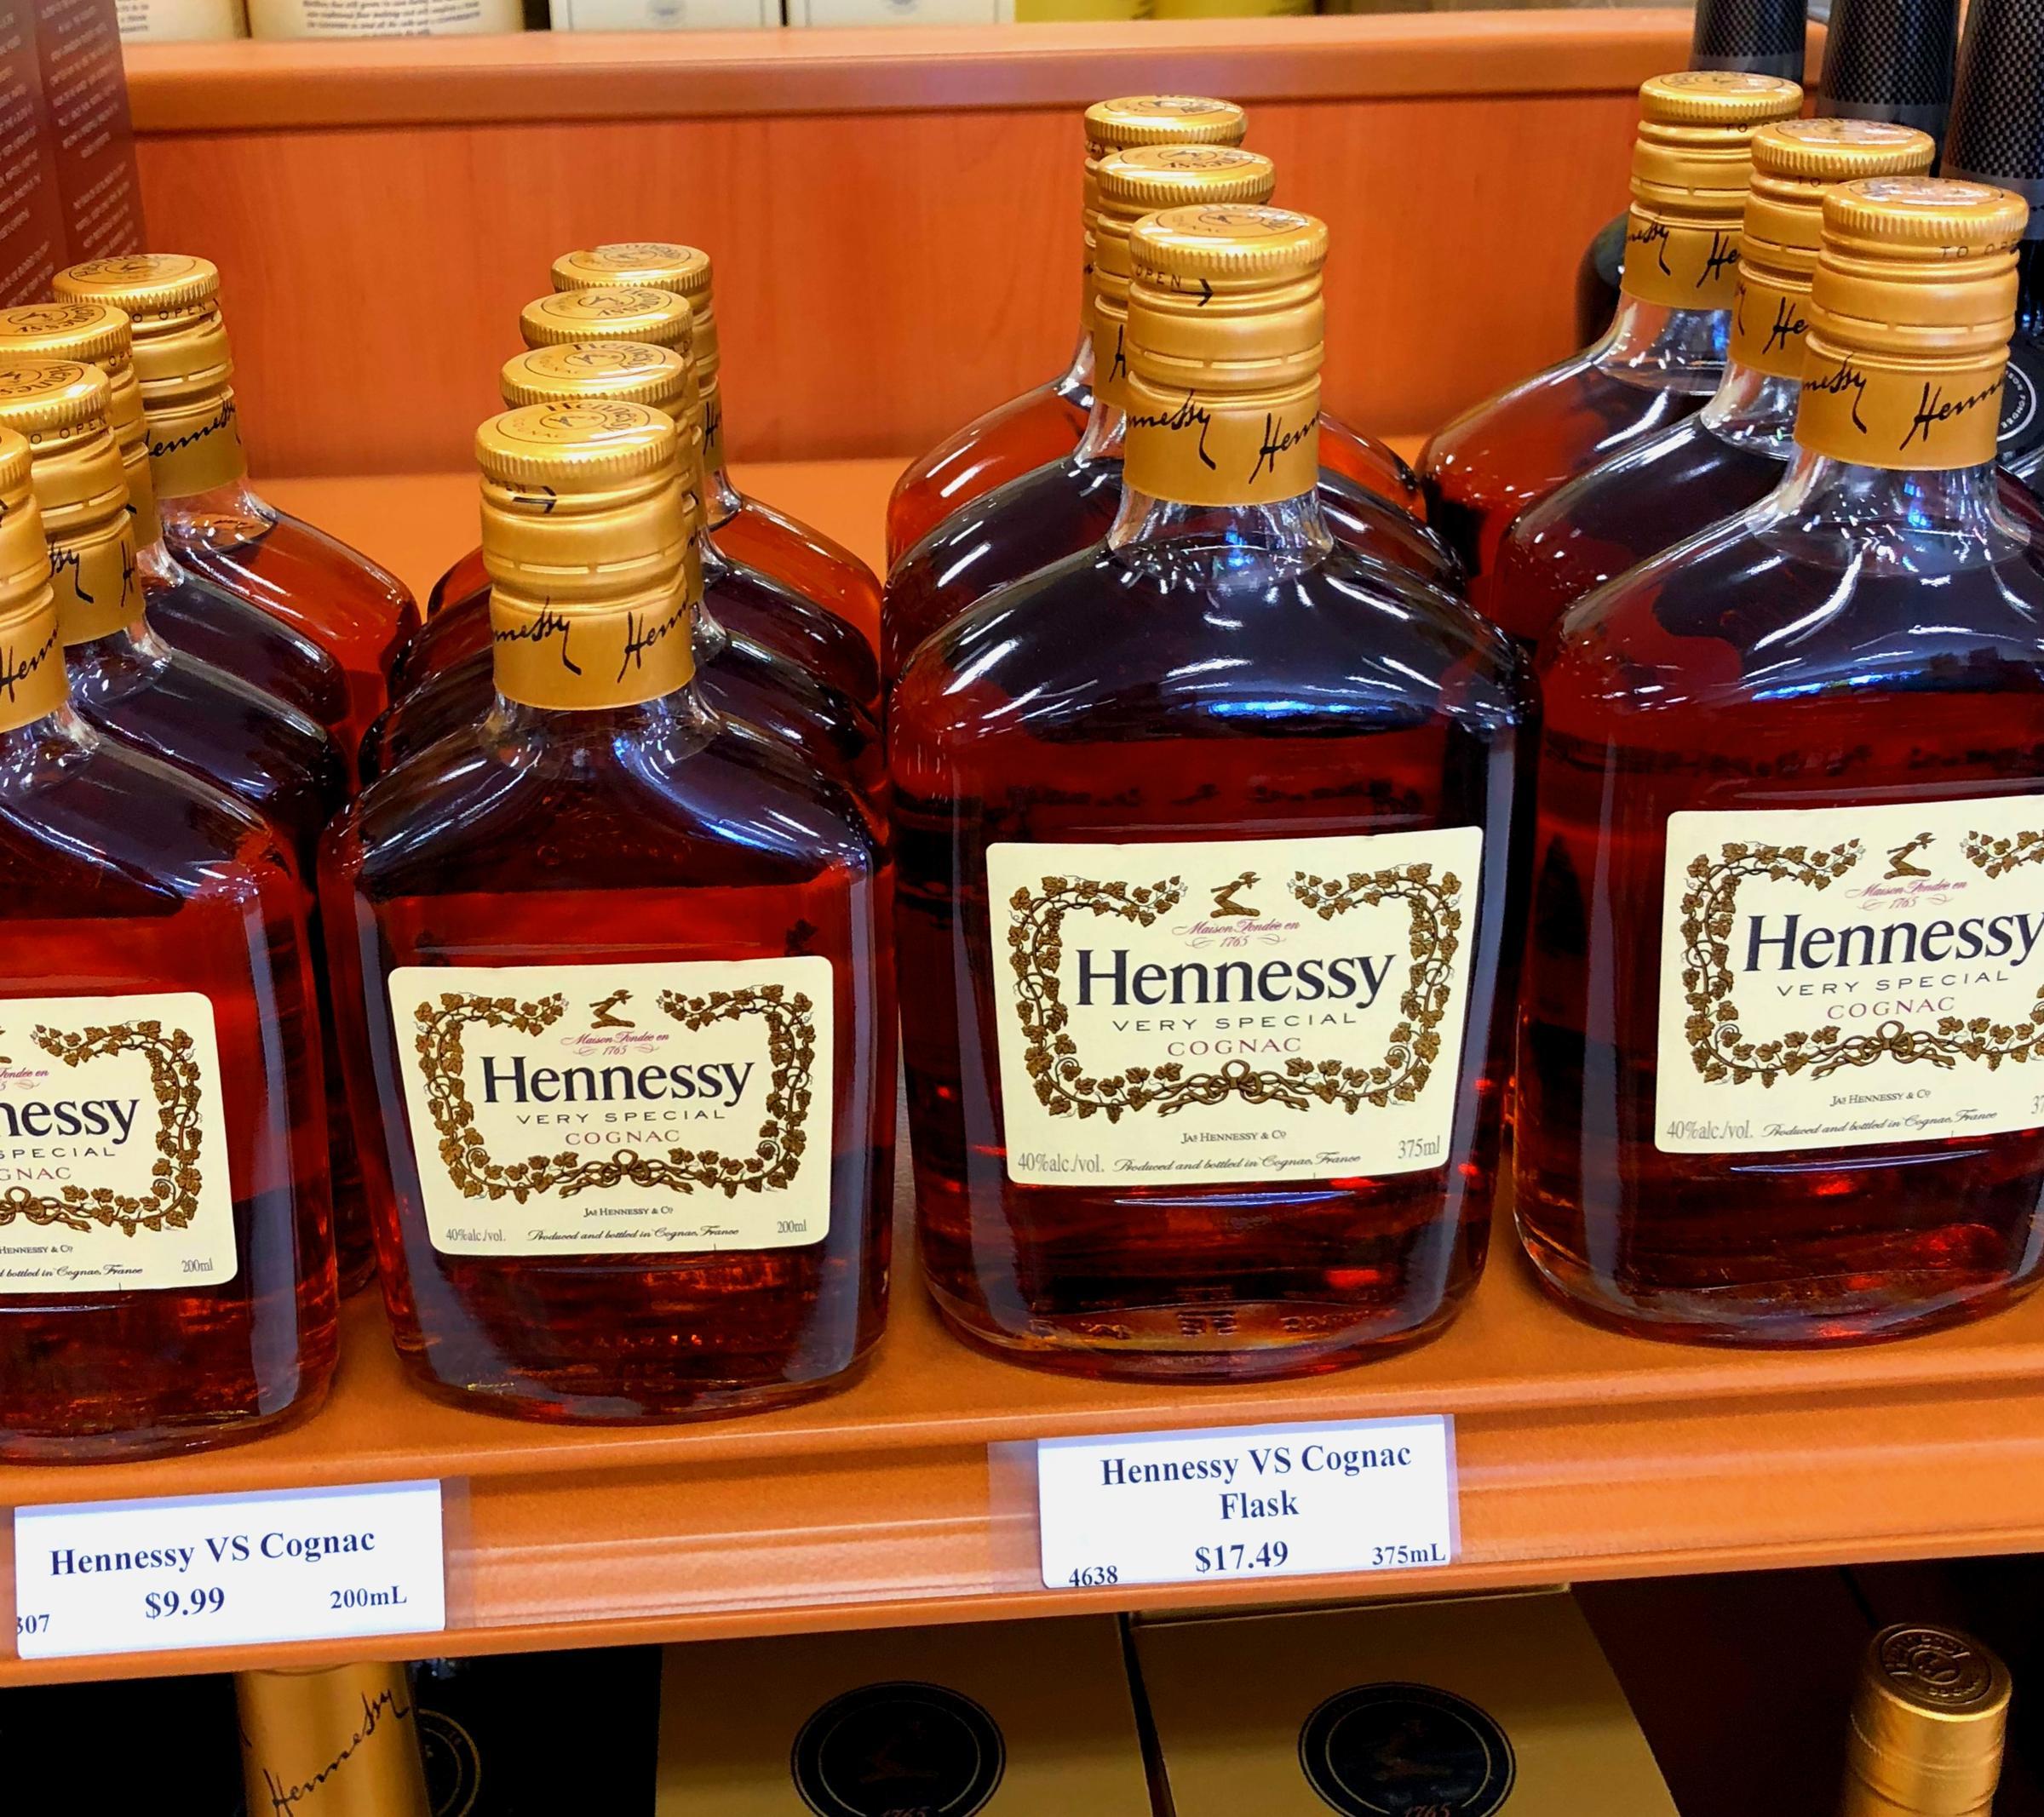 Hennessy Cognac, Liquor at Center of 'Bootlegging